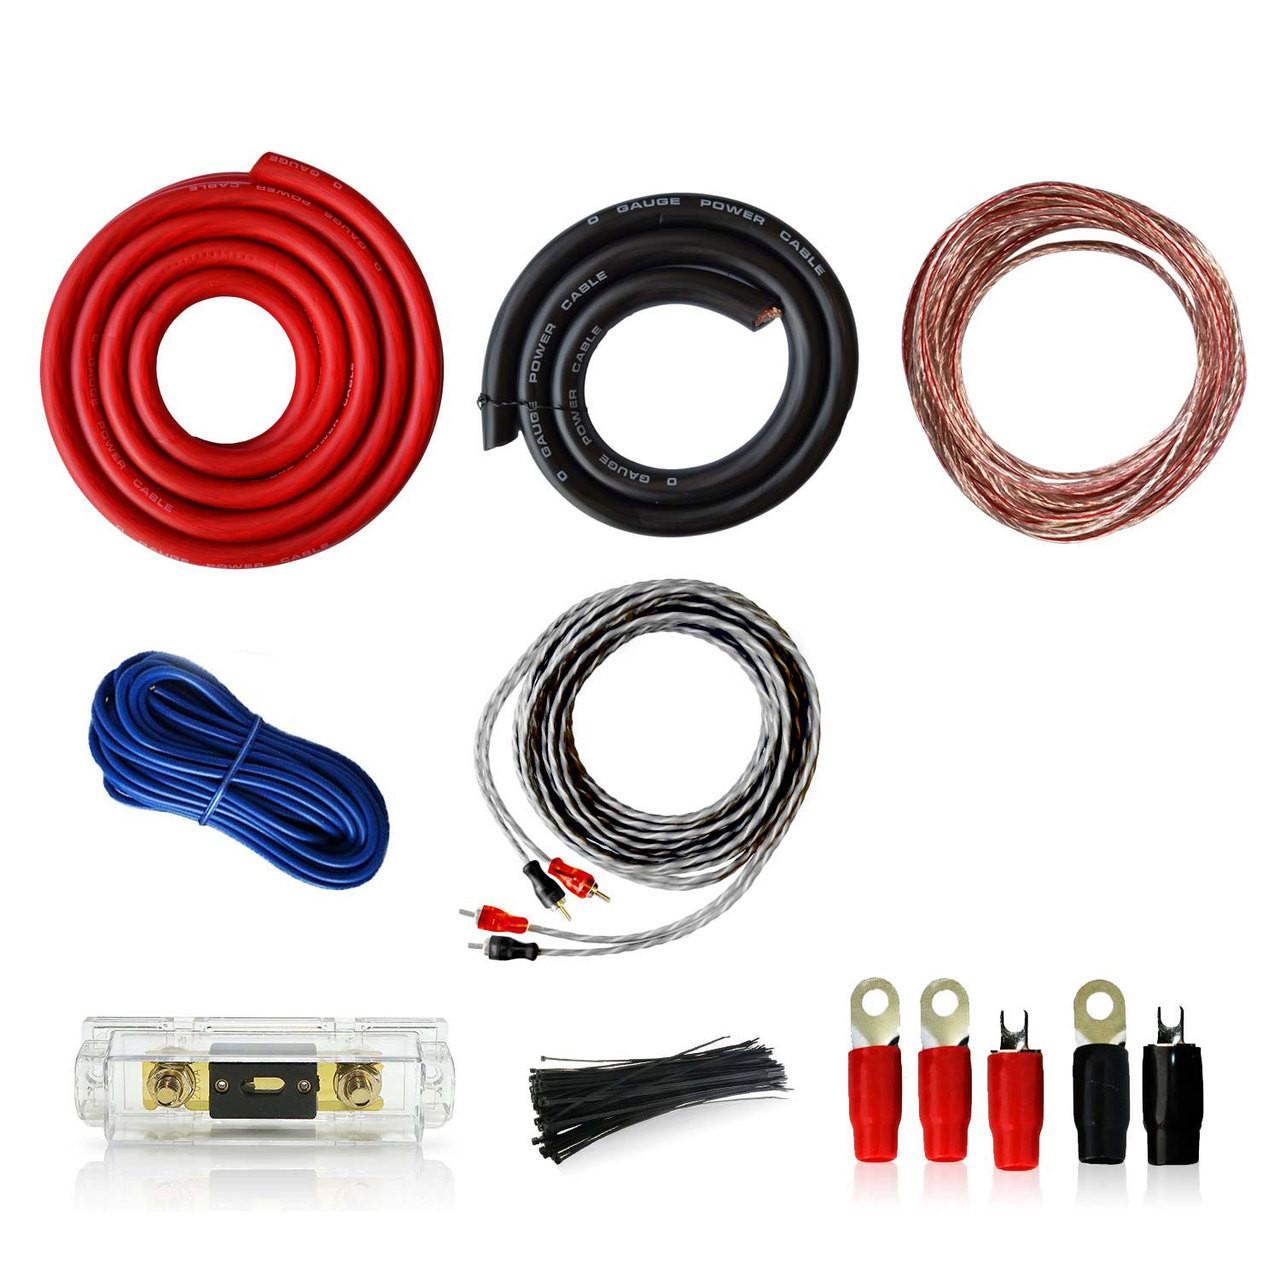 0awg car audio installation wiring kit 0 1 gauge genssi rh genssi com car audio wiring kit walmart car audio wiring kit best buy